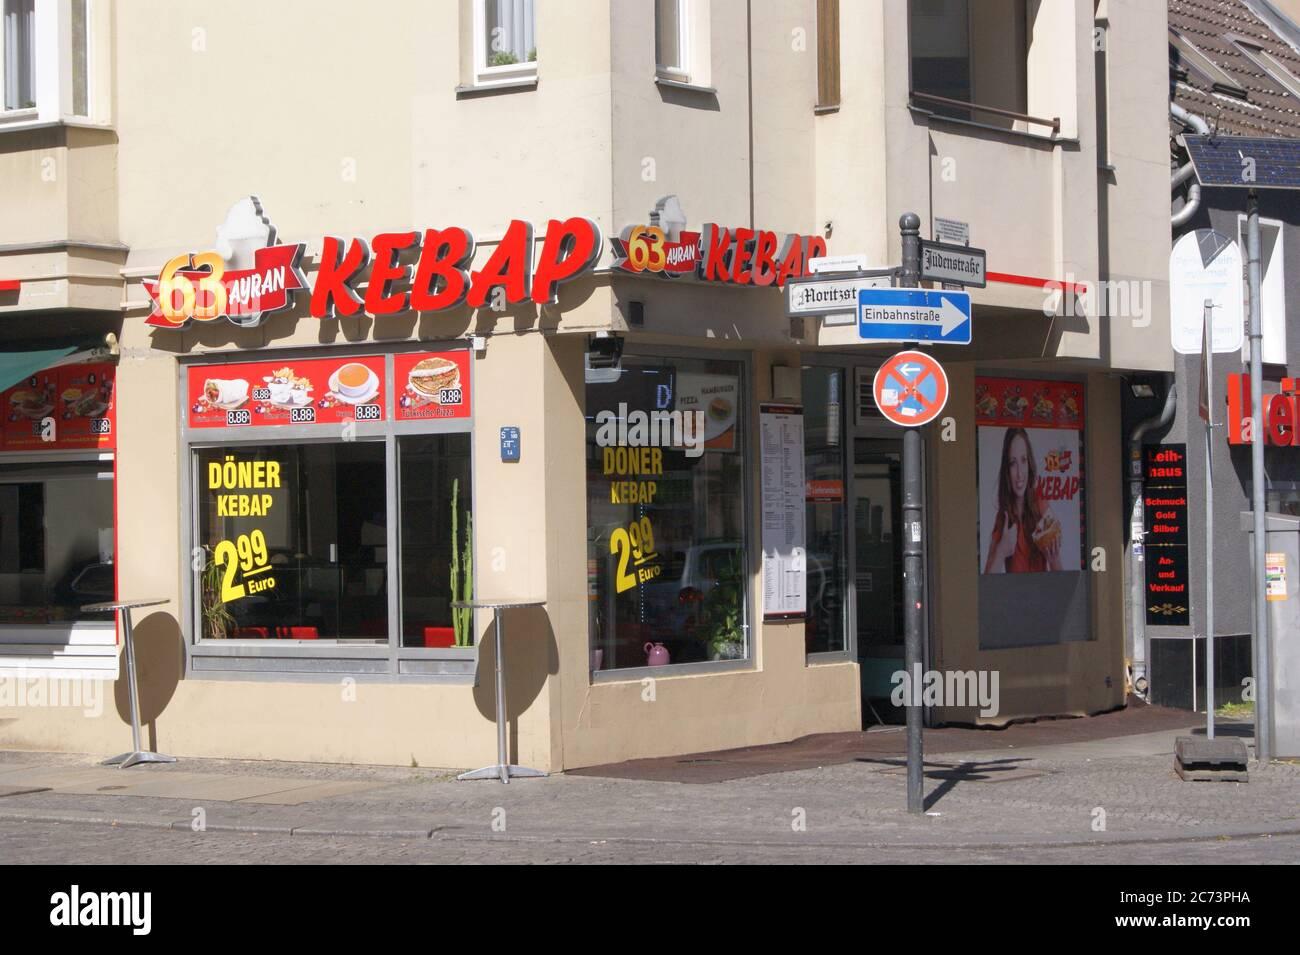 Kebap-Imbiss in der Jüdenstraße Ecke Moritzstraße in der Spandauer Altstadt Stock Photo